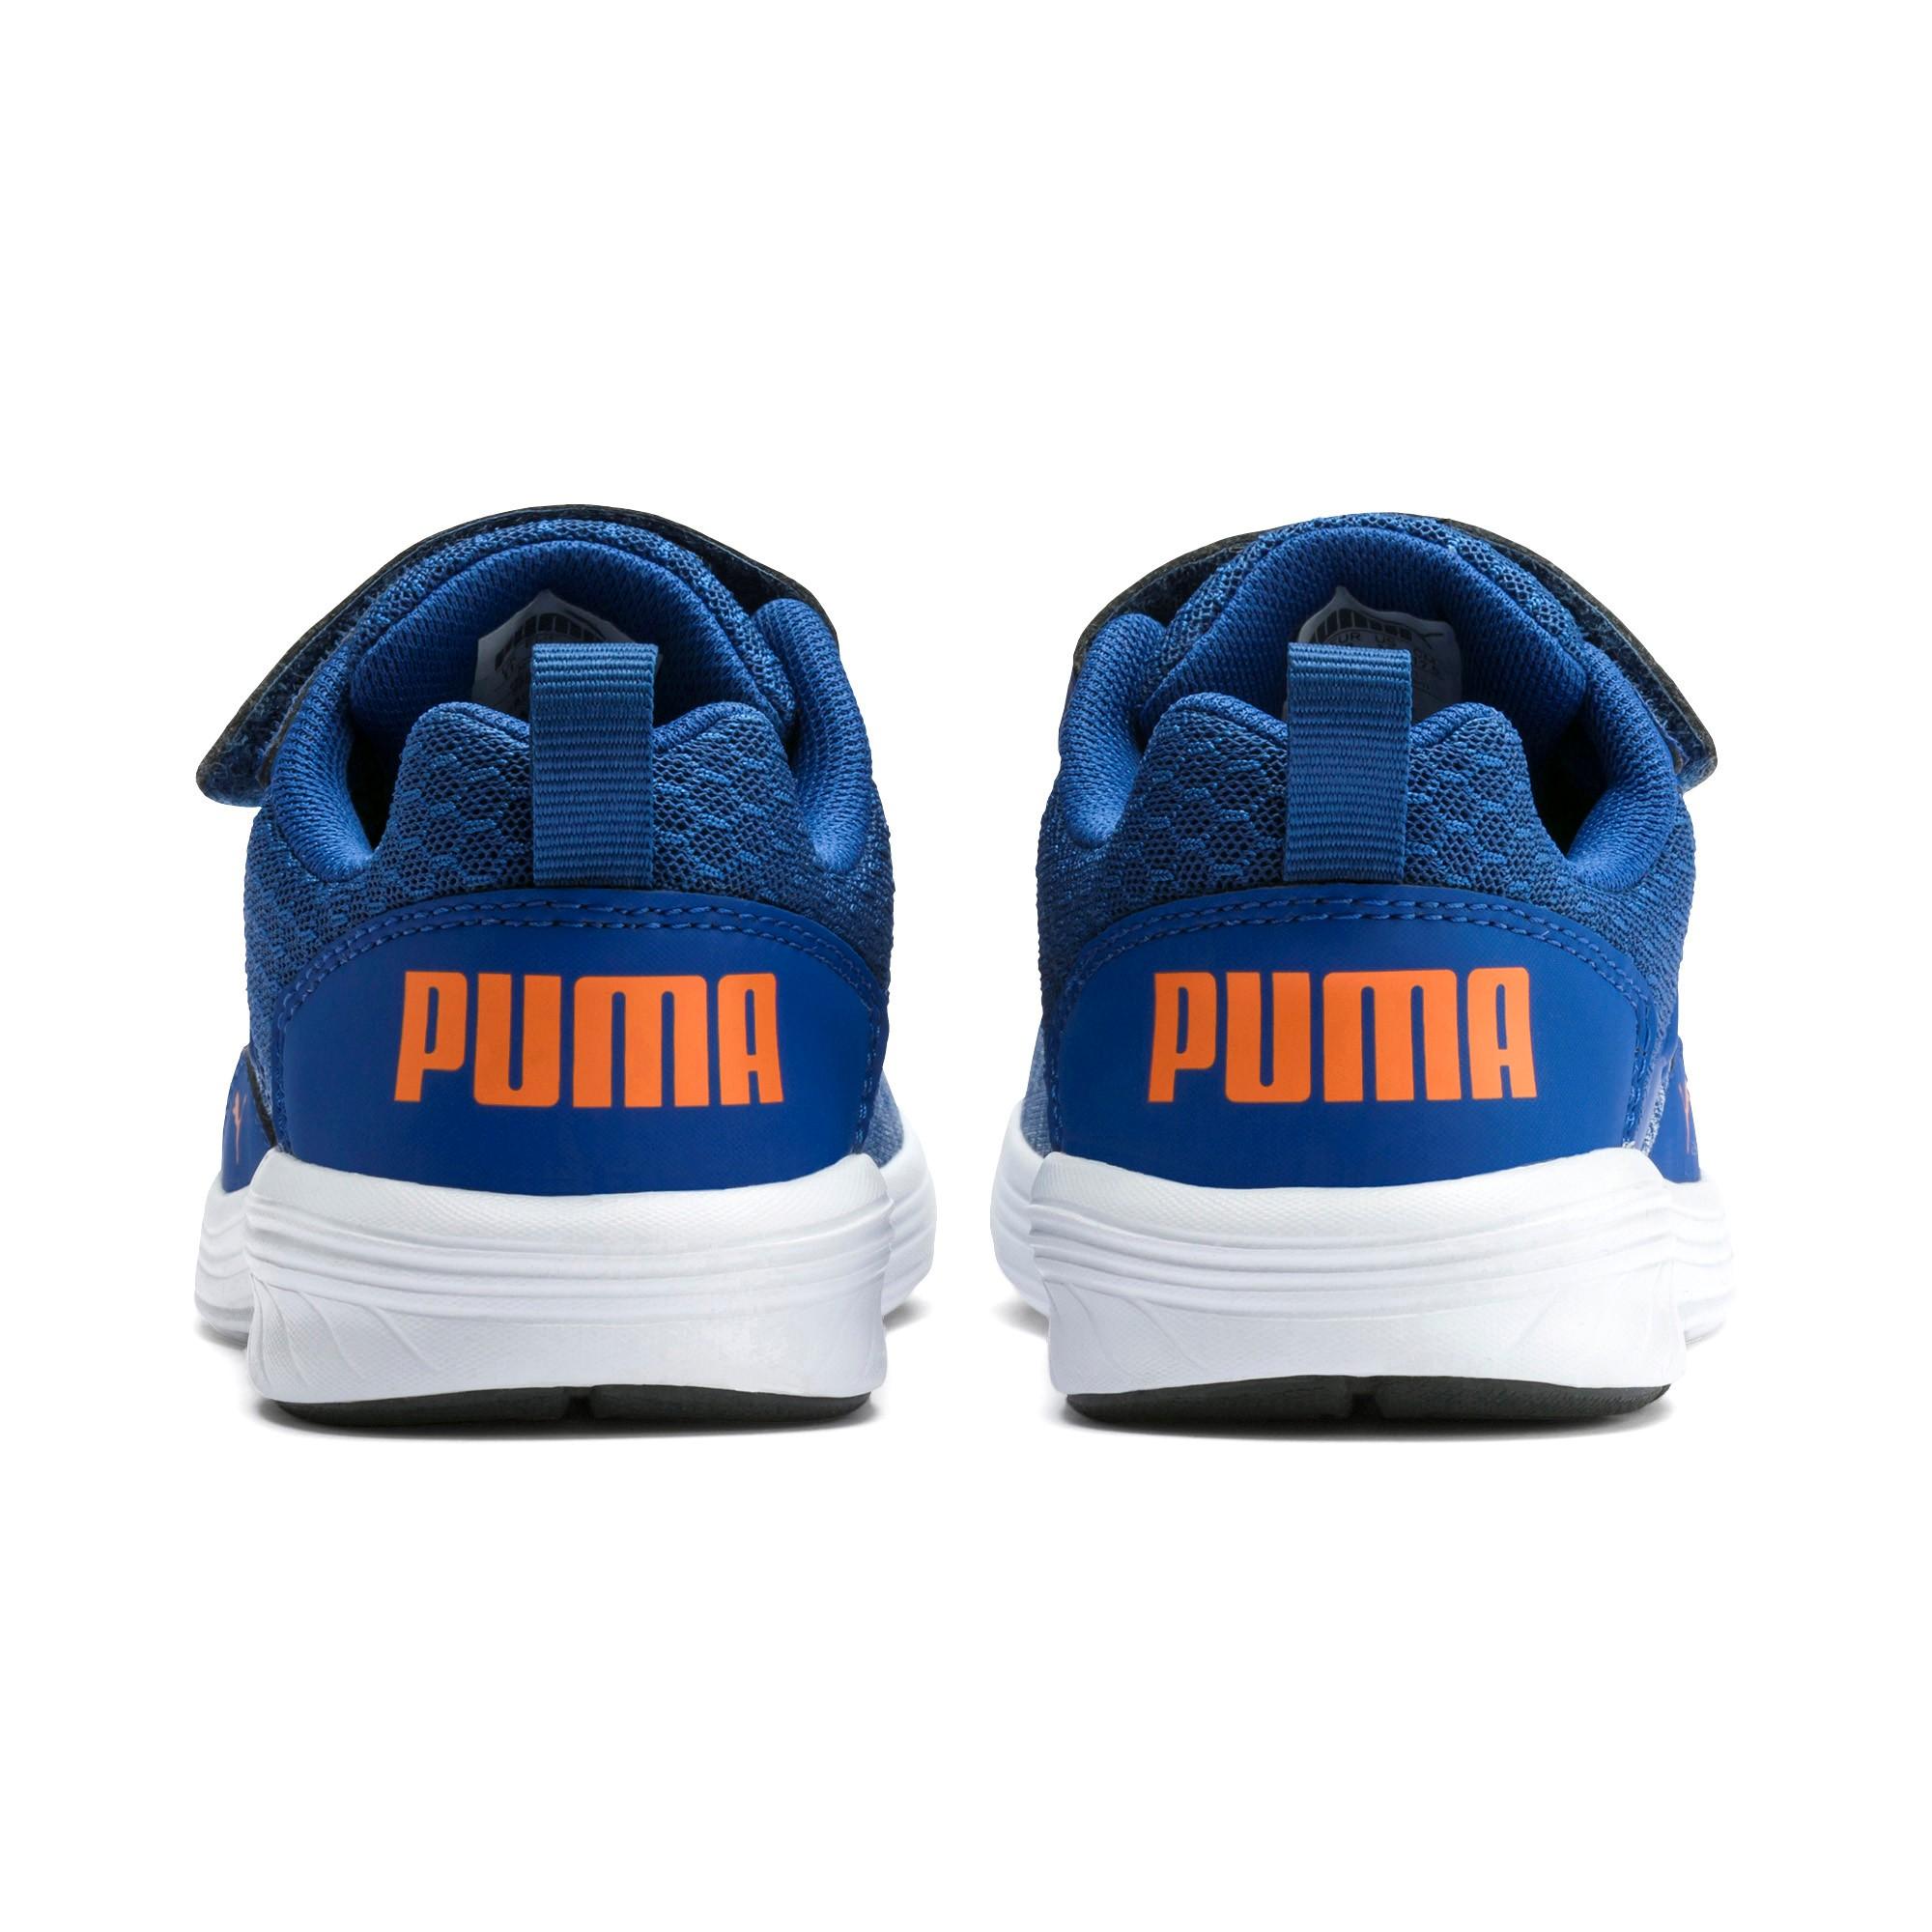 puma__pum-190676-10__35